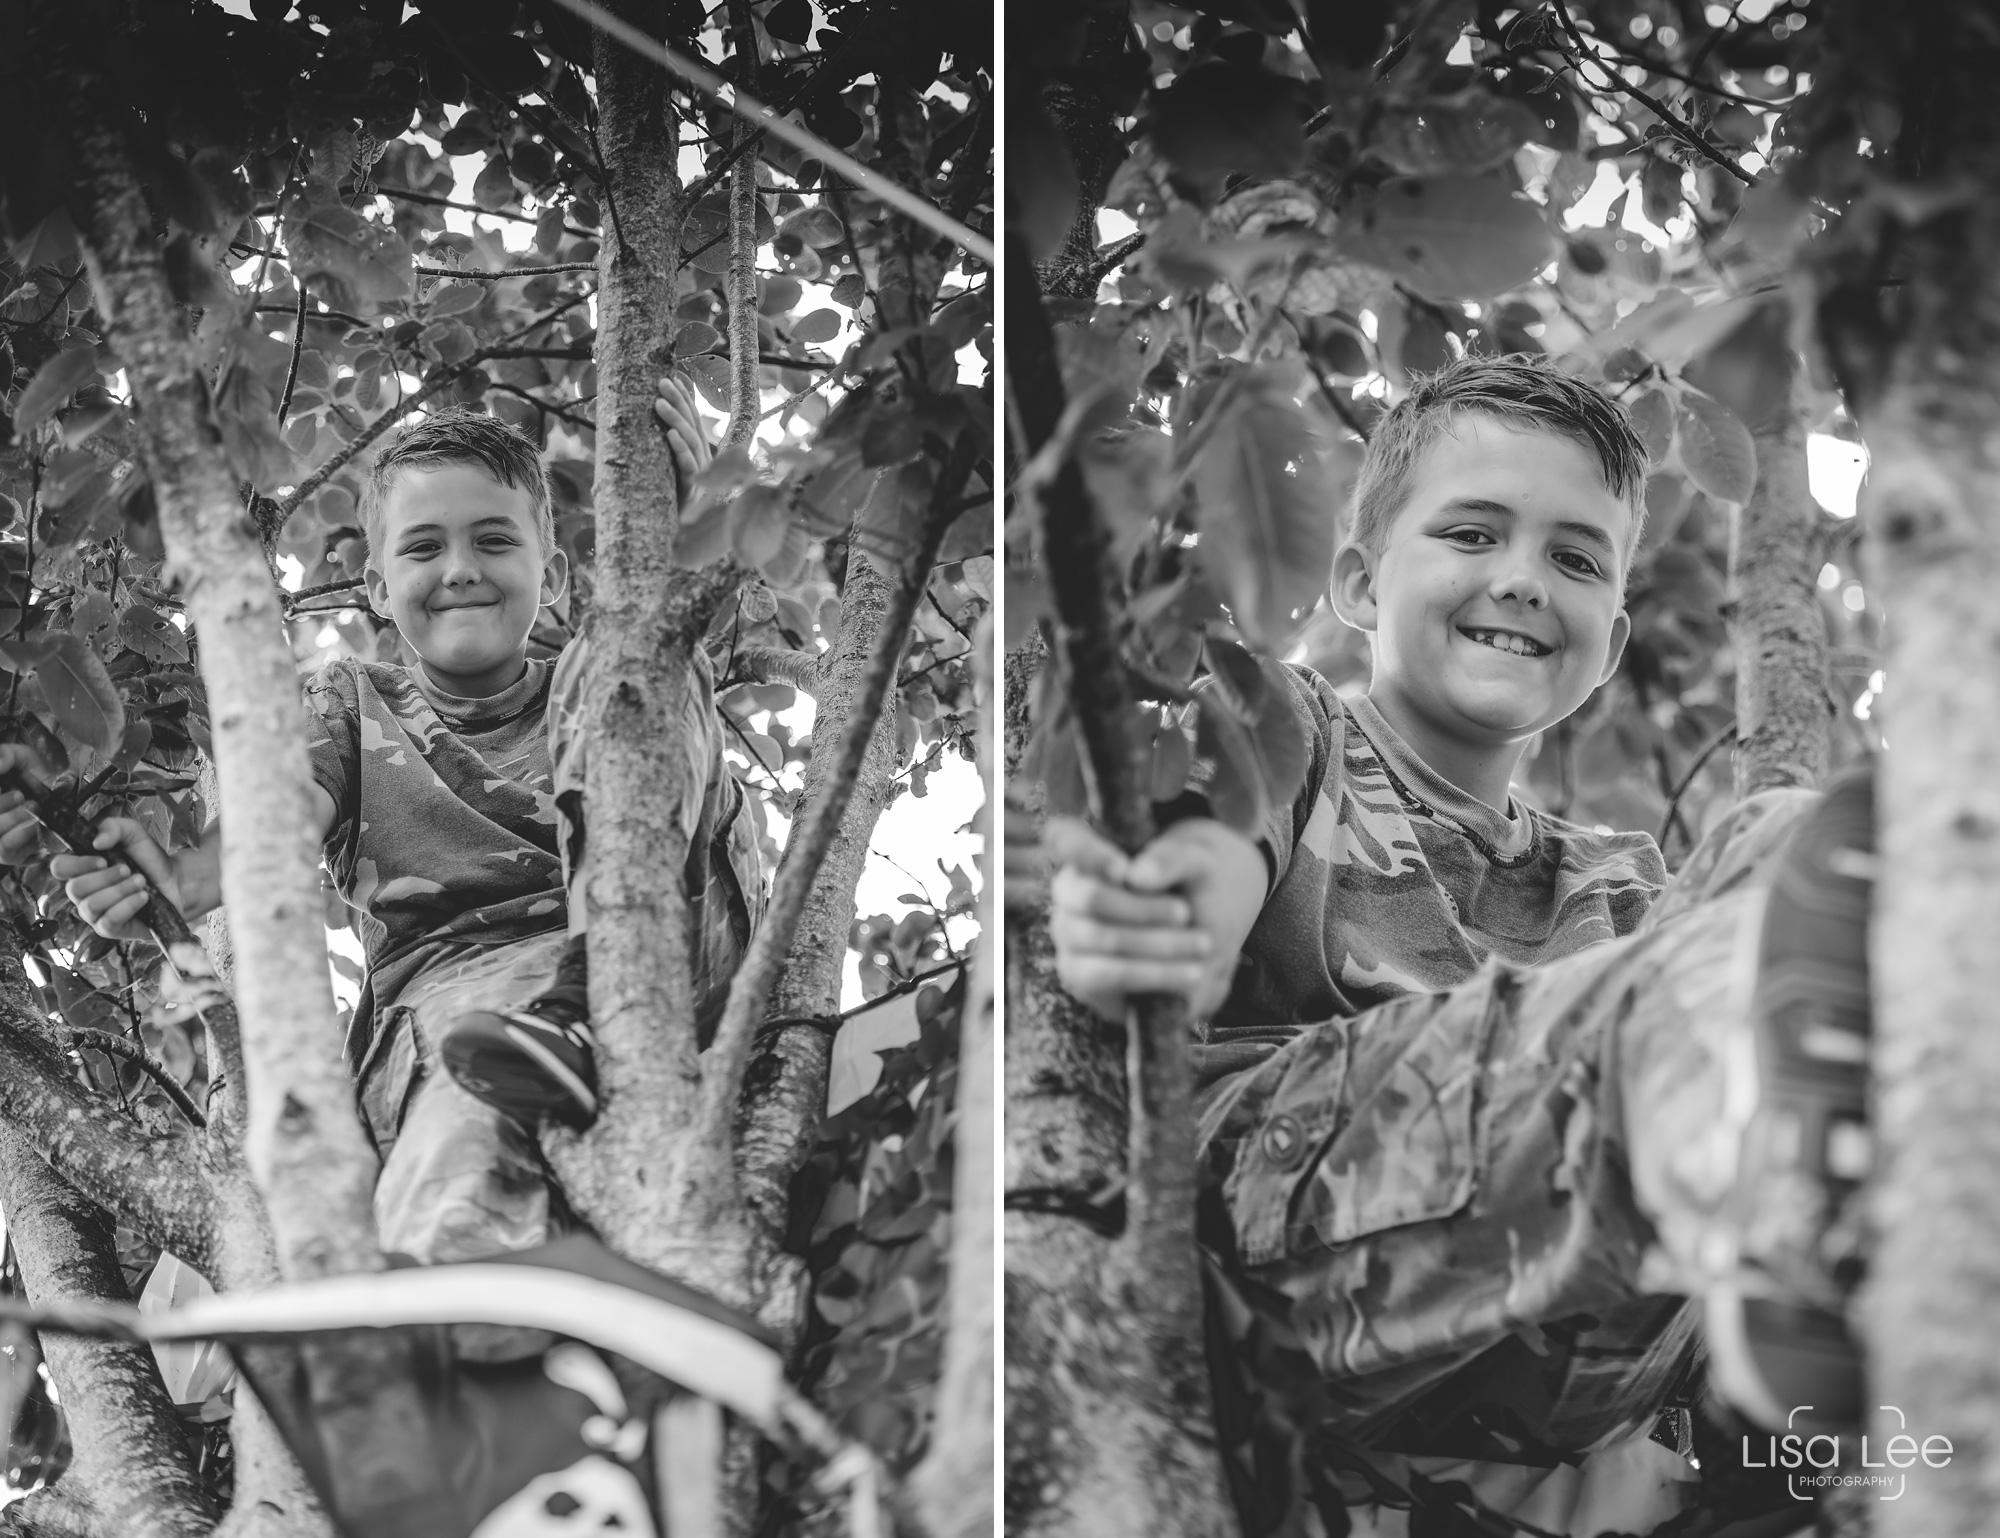 lisa-lee-photography-pateman-family-shoot-climbing-trees.jpg